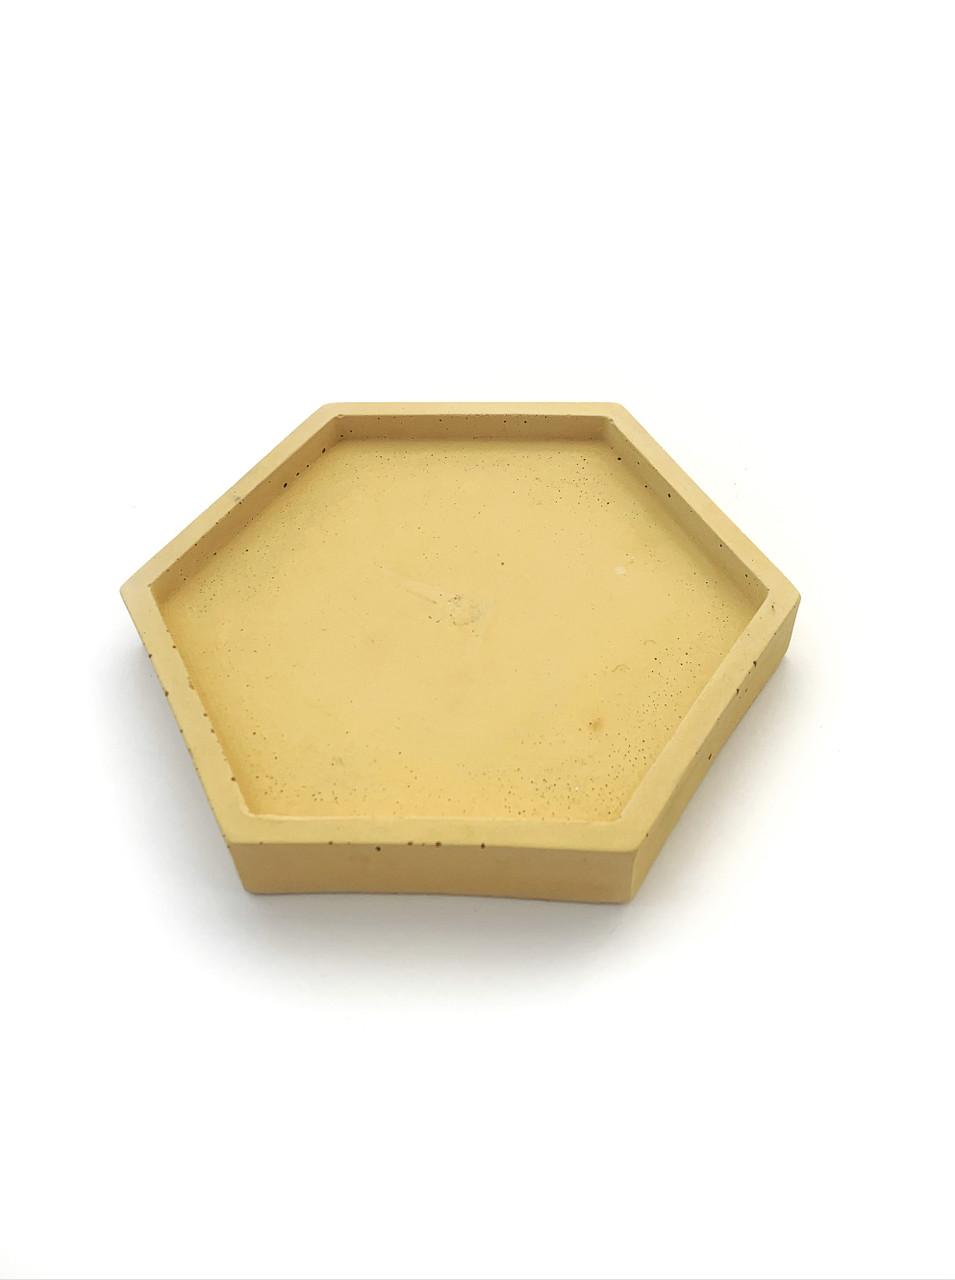 Бетонная подставка Decoline (желтая) B1004-6